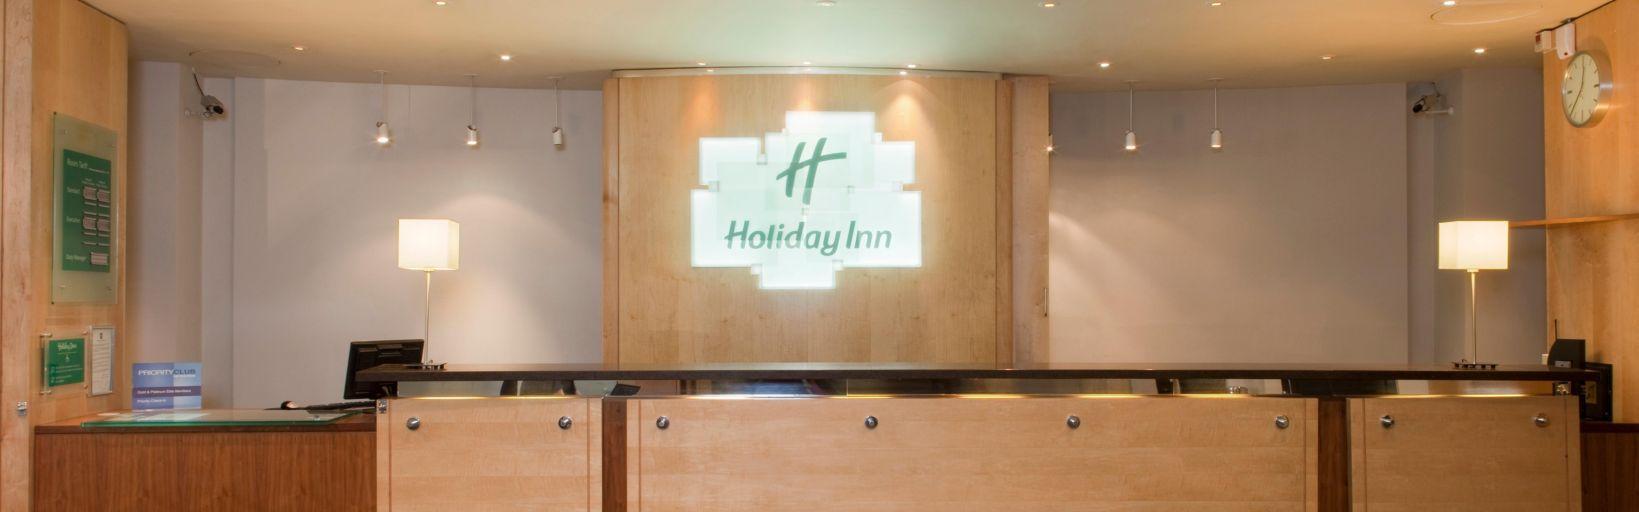 Airport Hotel Holiday Inn London Heathrow Ariel